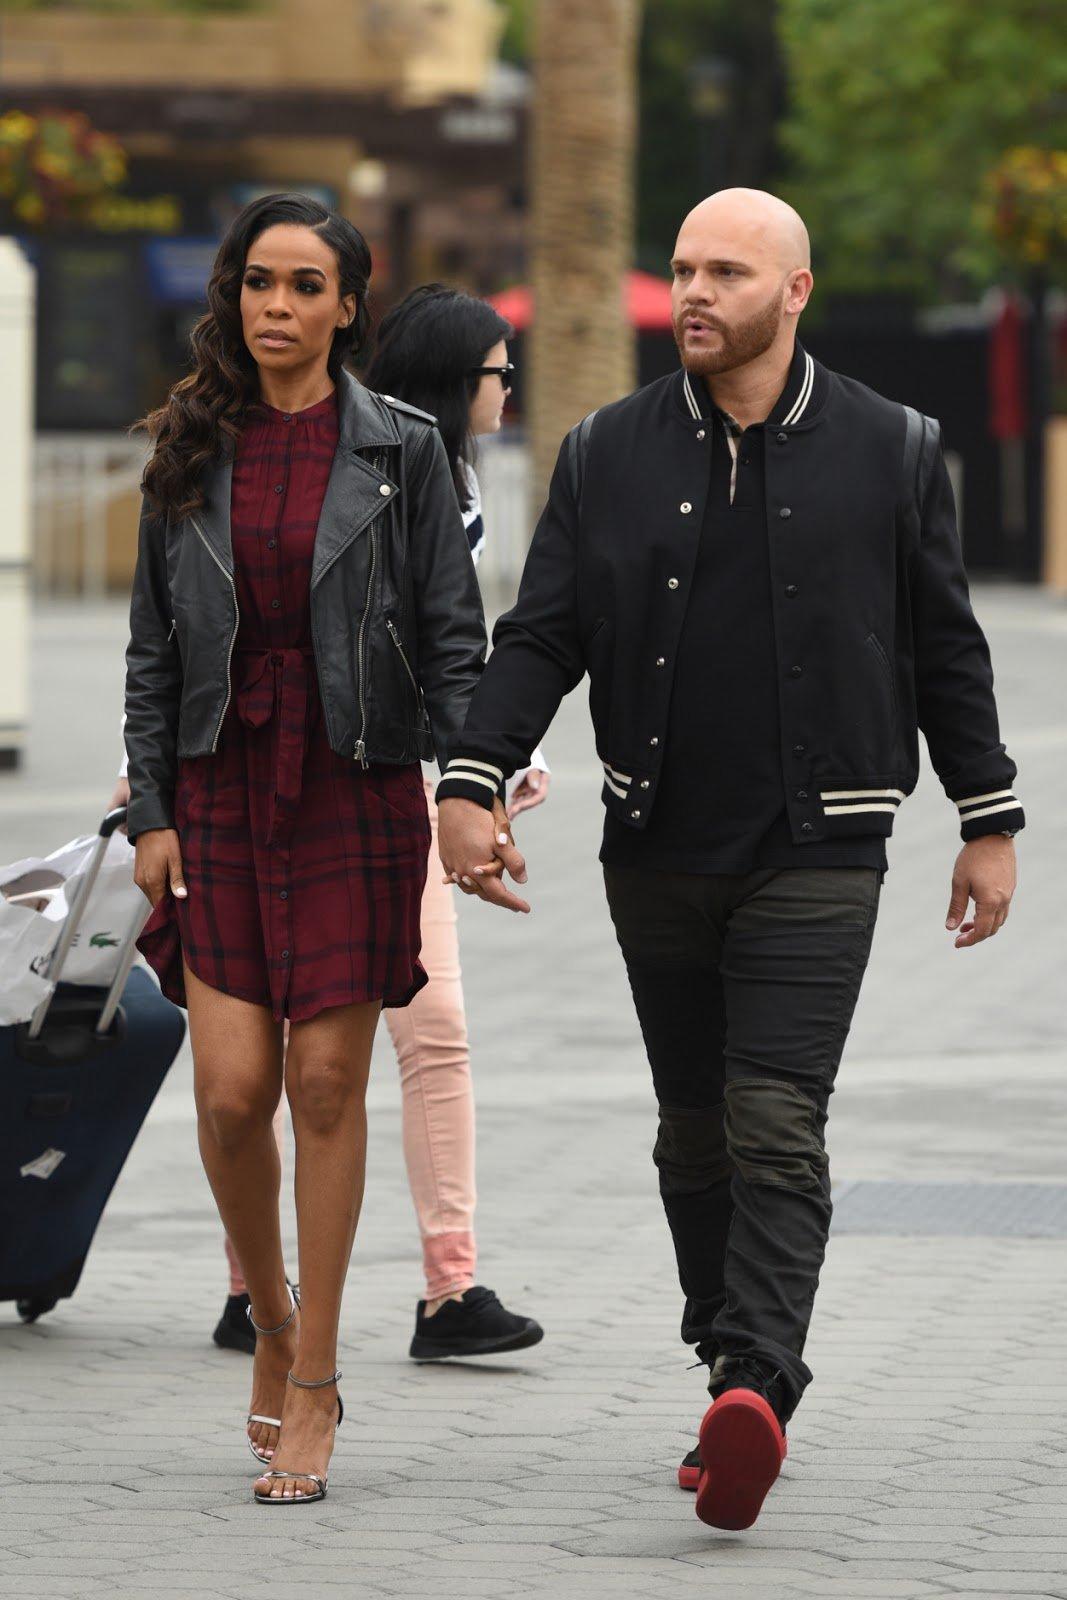 I Remain Single: Michelle Williams Announces Breakup With Chad Johnson